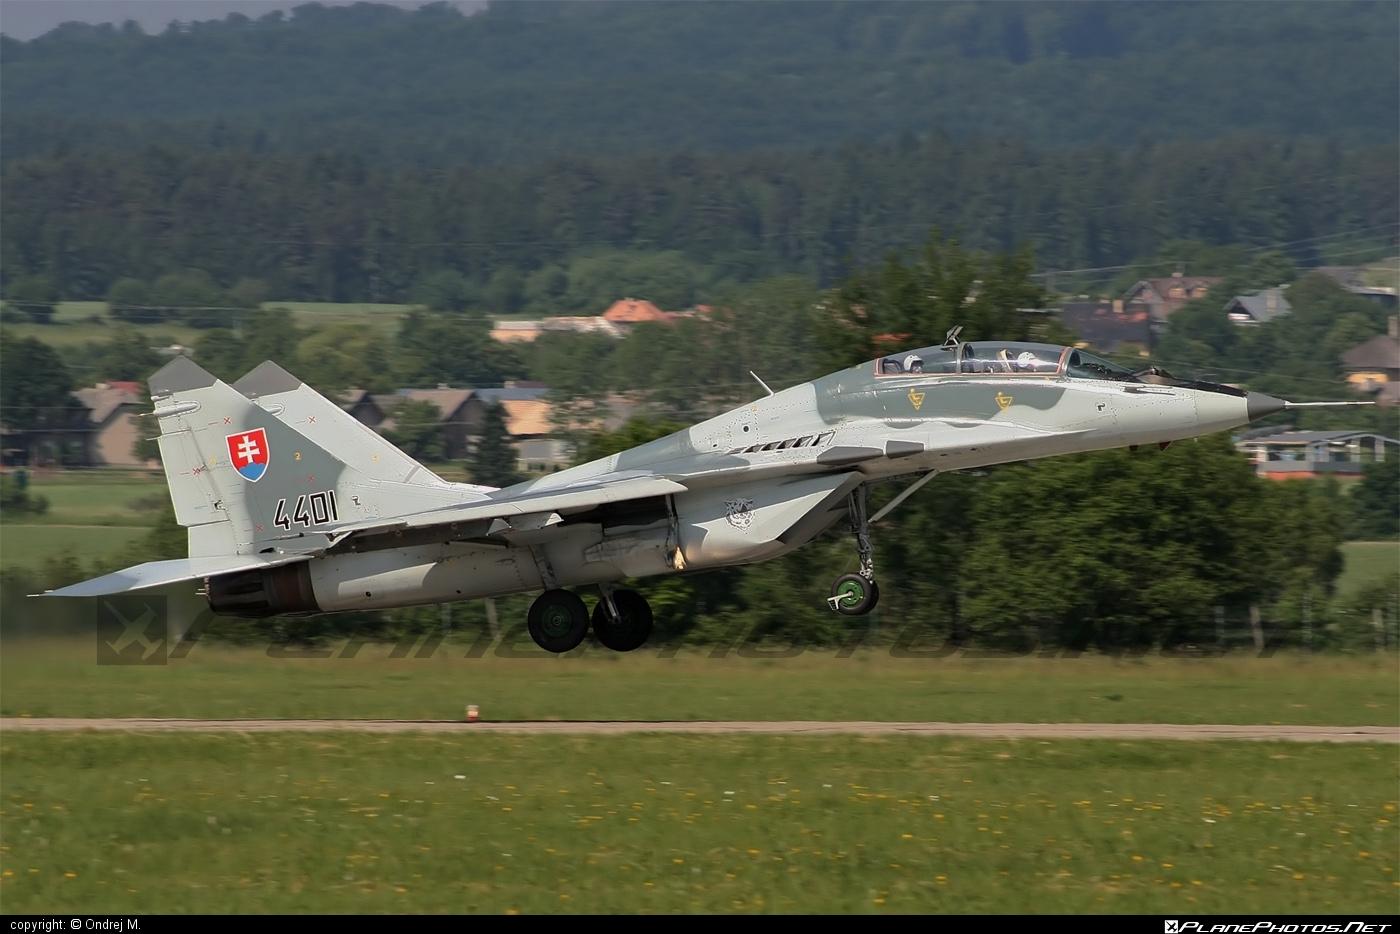 Mikoyan-Gurevich MiG-29UB - 4401 operated by Vzdušné sily OS SR (Slovak Air Force) #mig #mig29 #mig29ub #mikoyangurevich #slovakairforce #vzdusnesilyossr